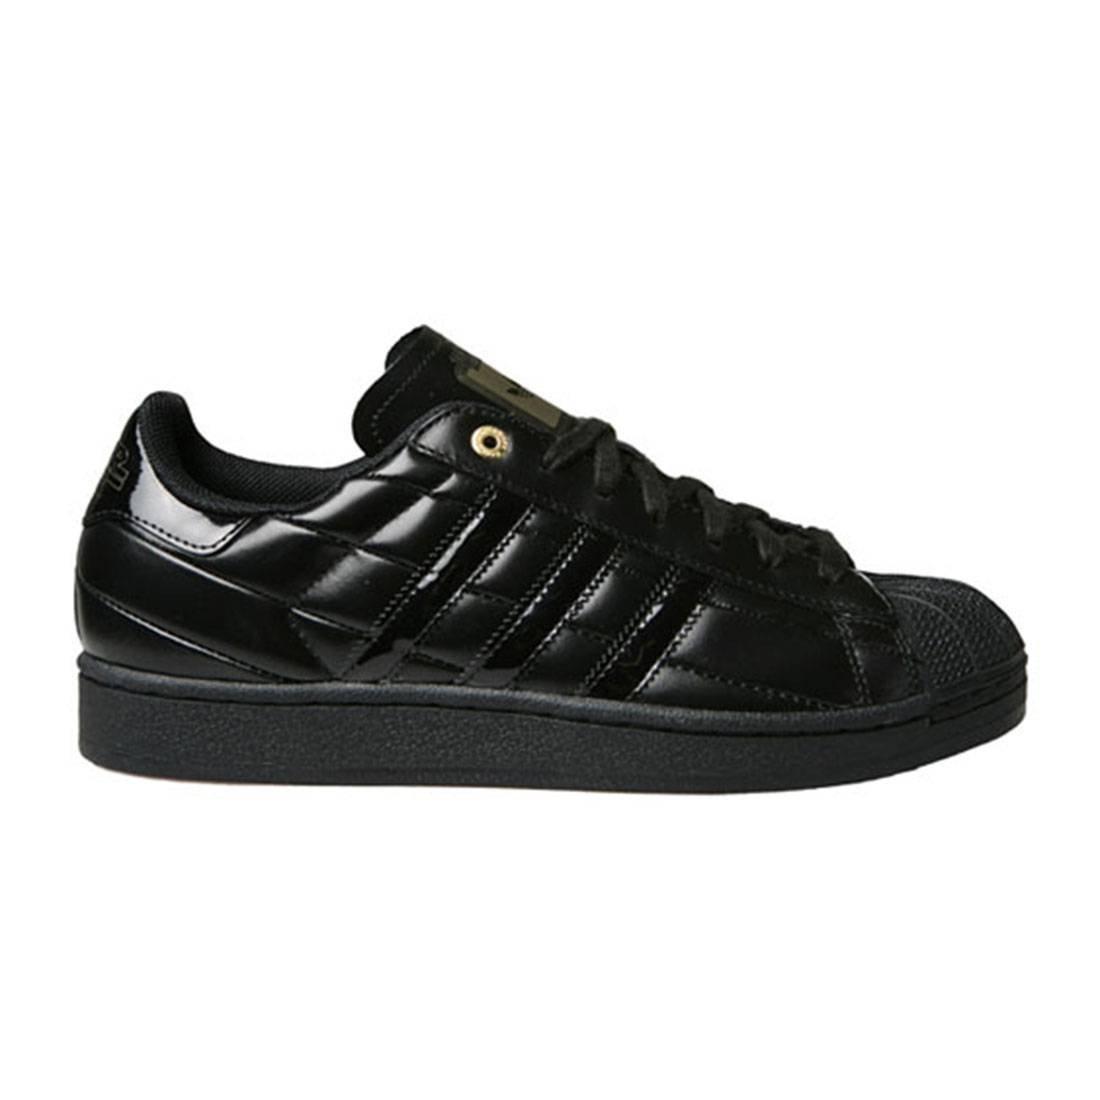 outlet store c60ae 50f0b Amazon.com | adidas Superstar 1 F Consortium Edition ...